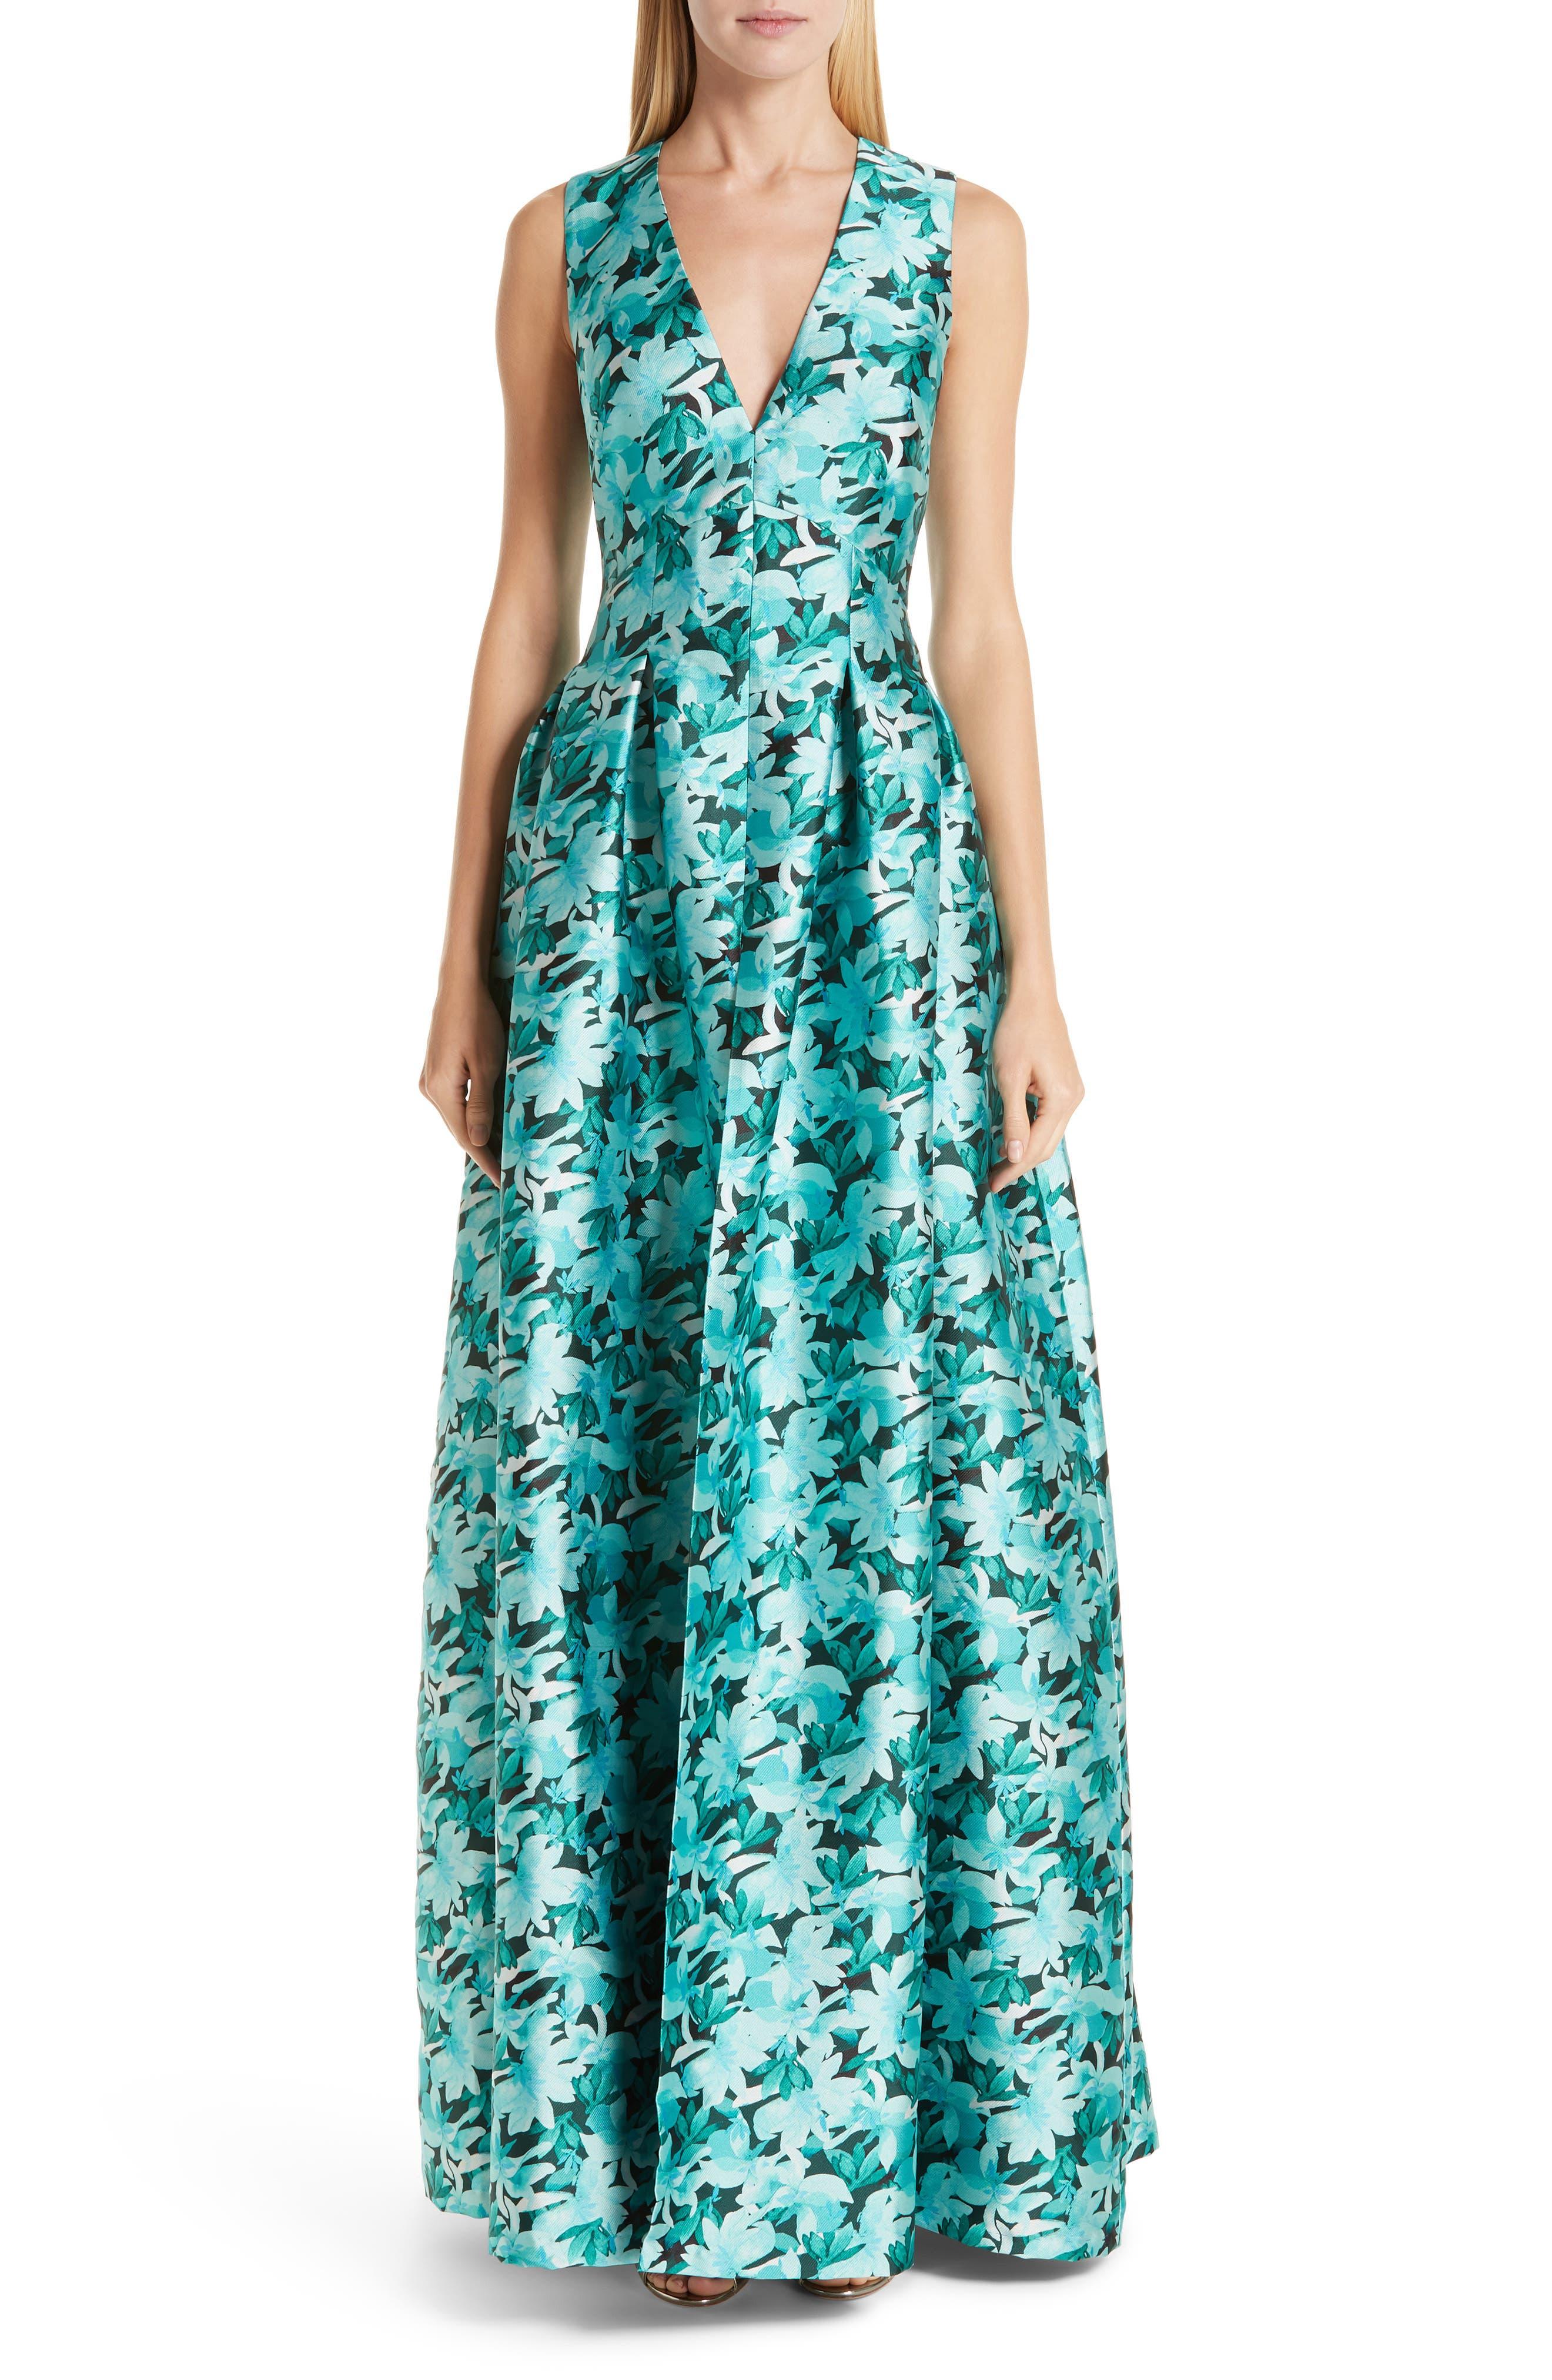 SACHIN & BABI, Brooke Floral Print Gown, Main thumbnail 1, color, TEAL